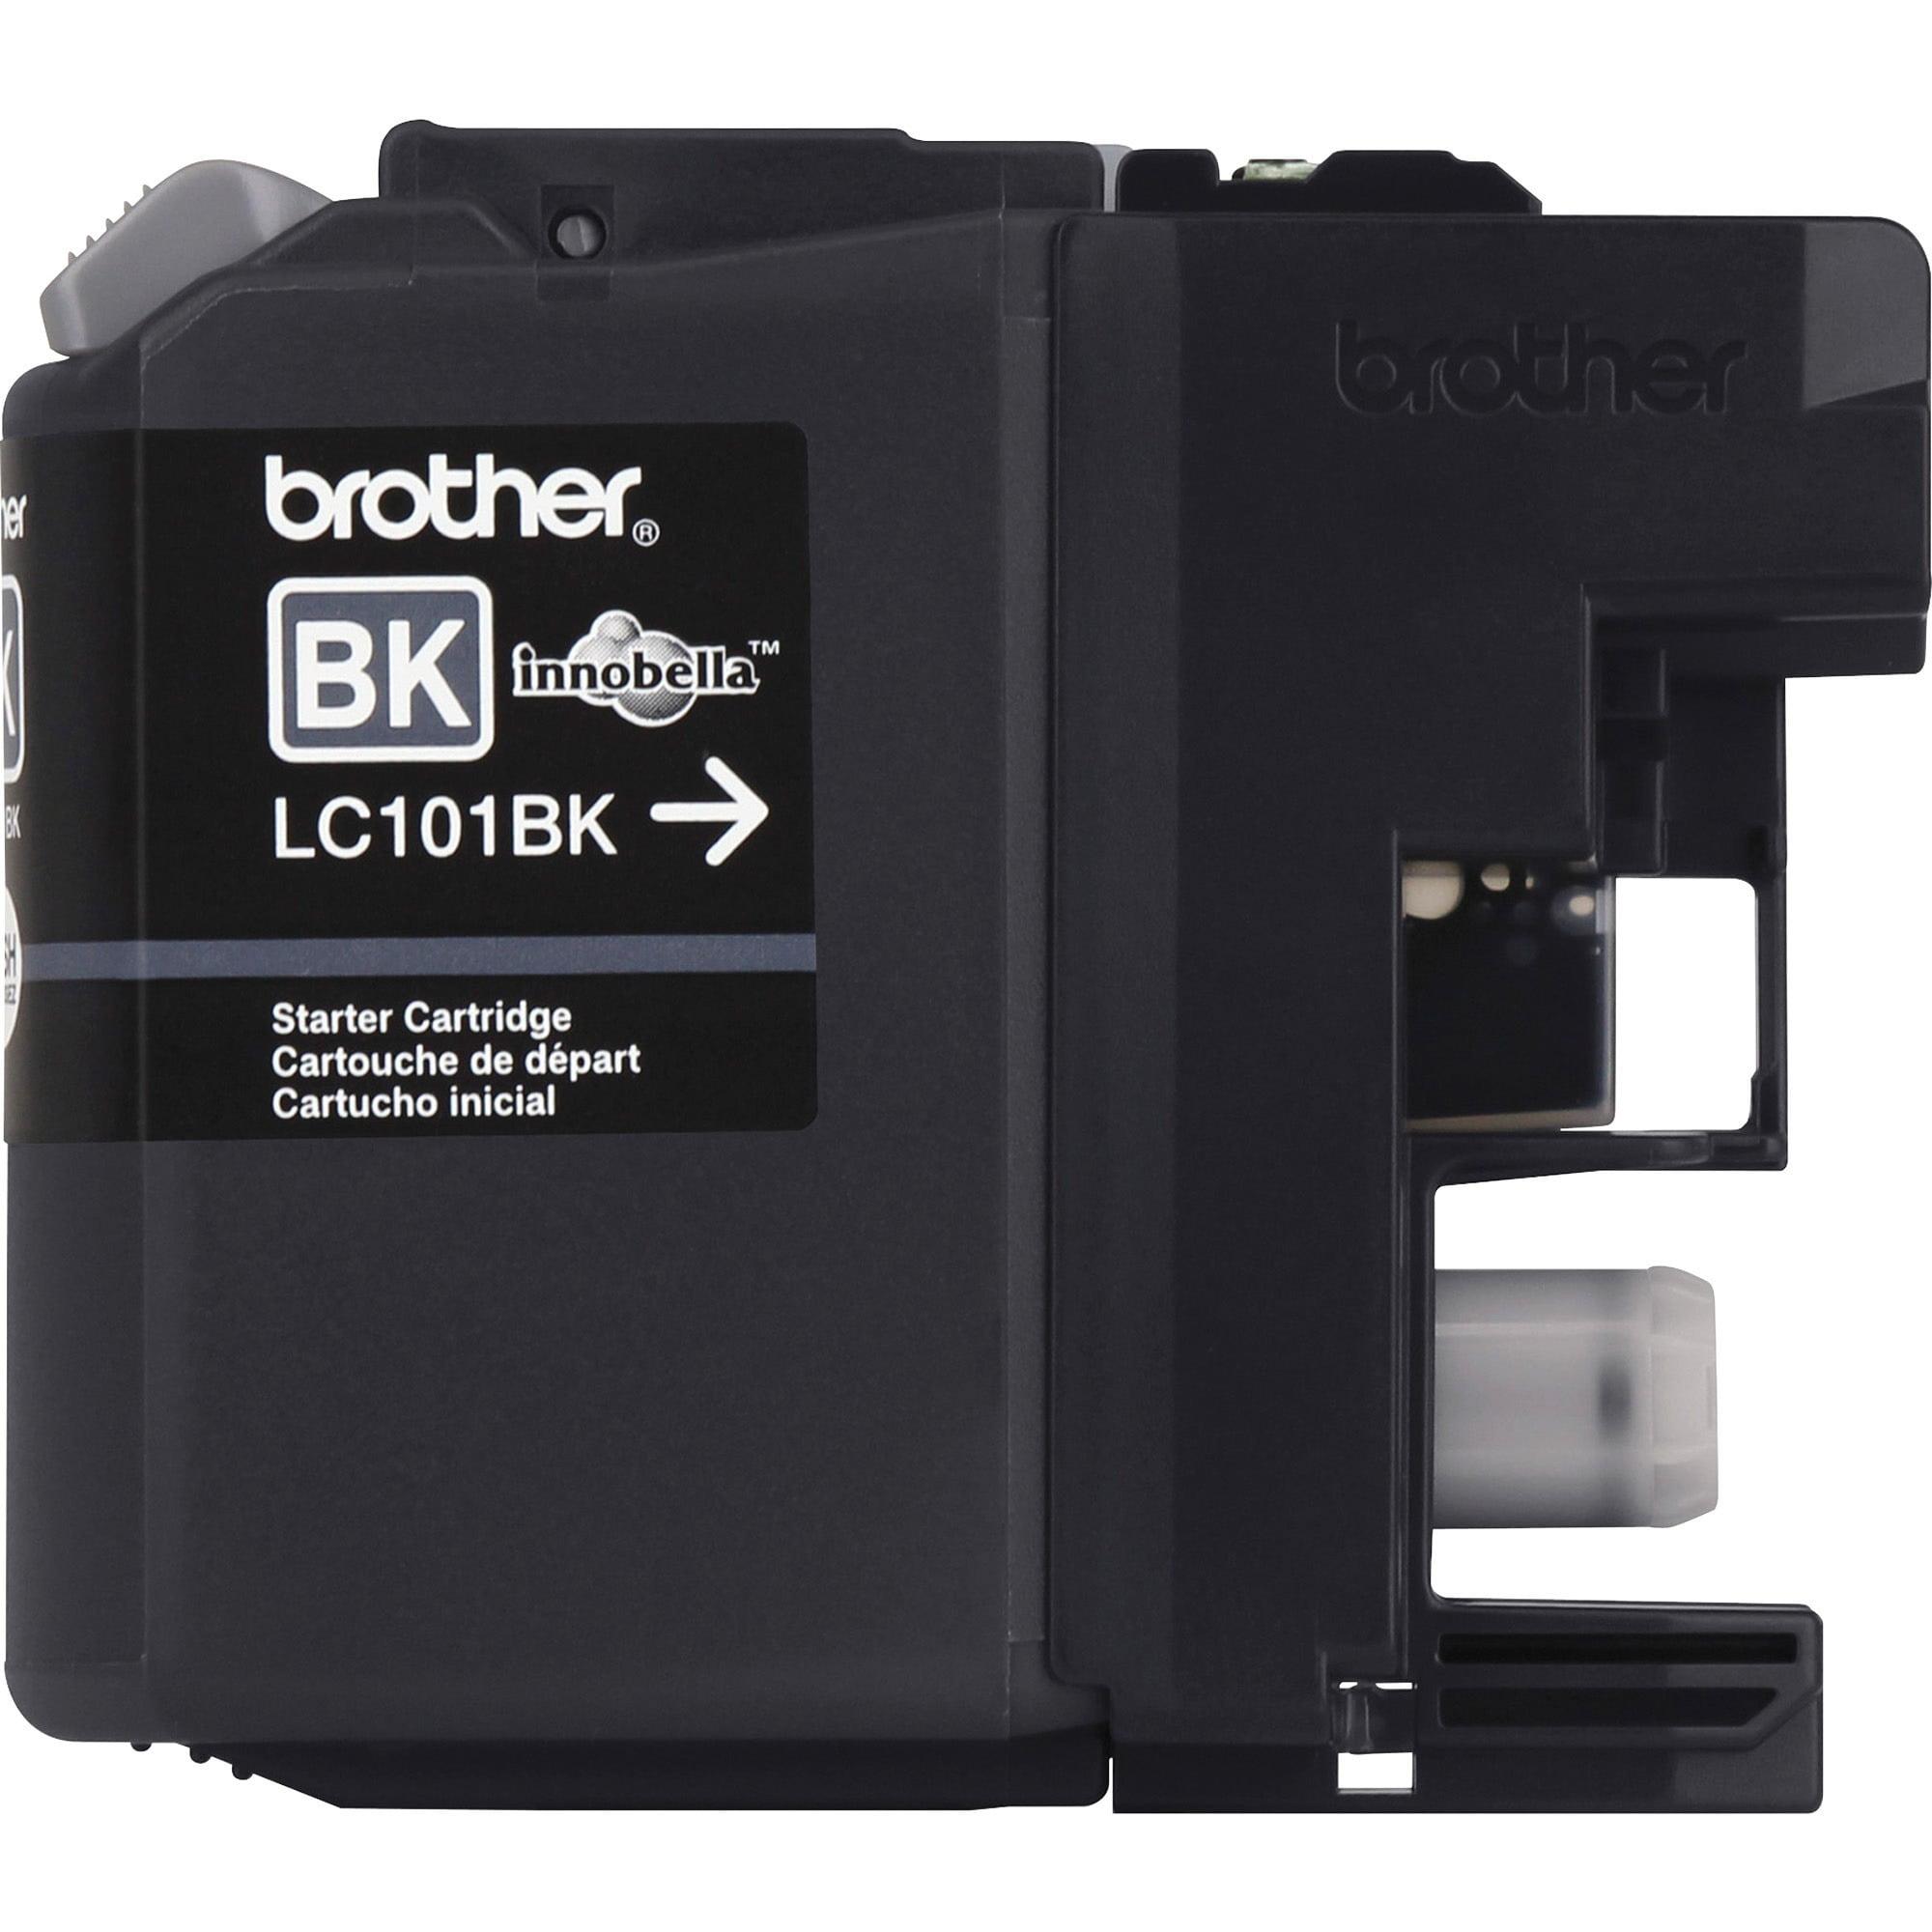 Brother LC101BK Innobella Ink, Black